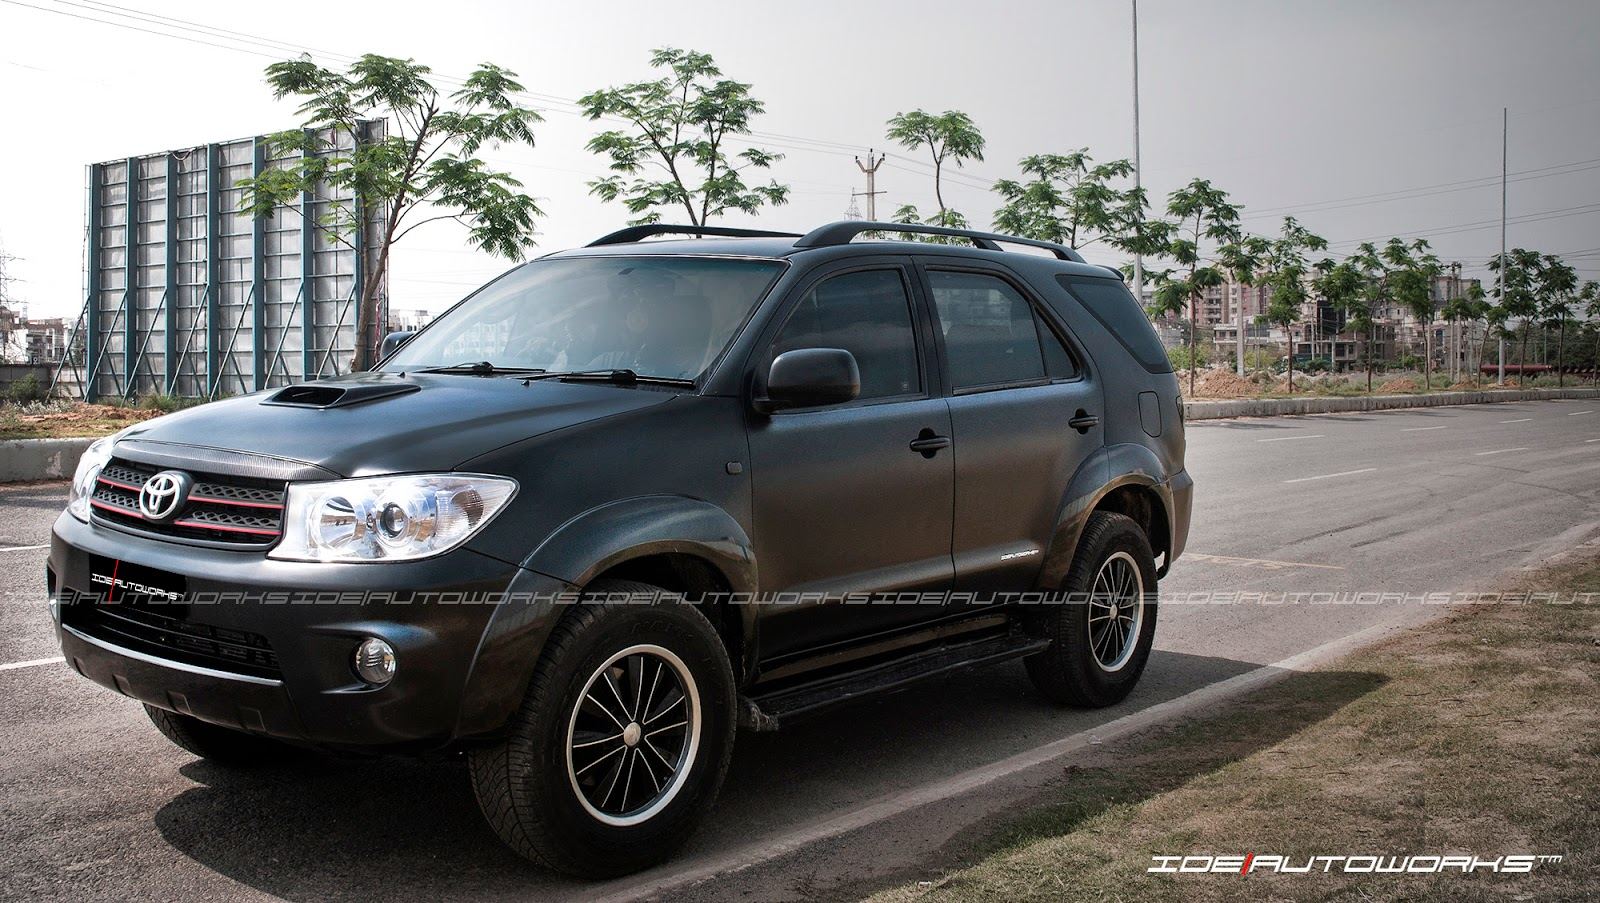 Toyota Fortuner Satin Matte Black Full Car Wrap Ide Autoworks